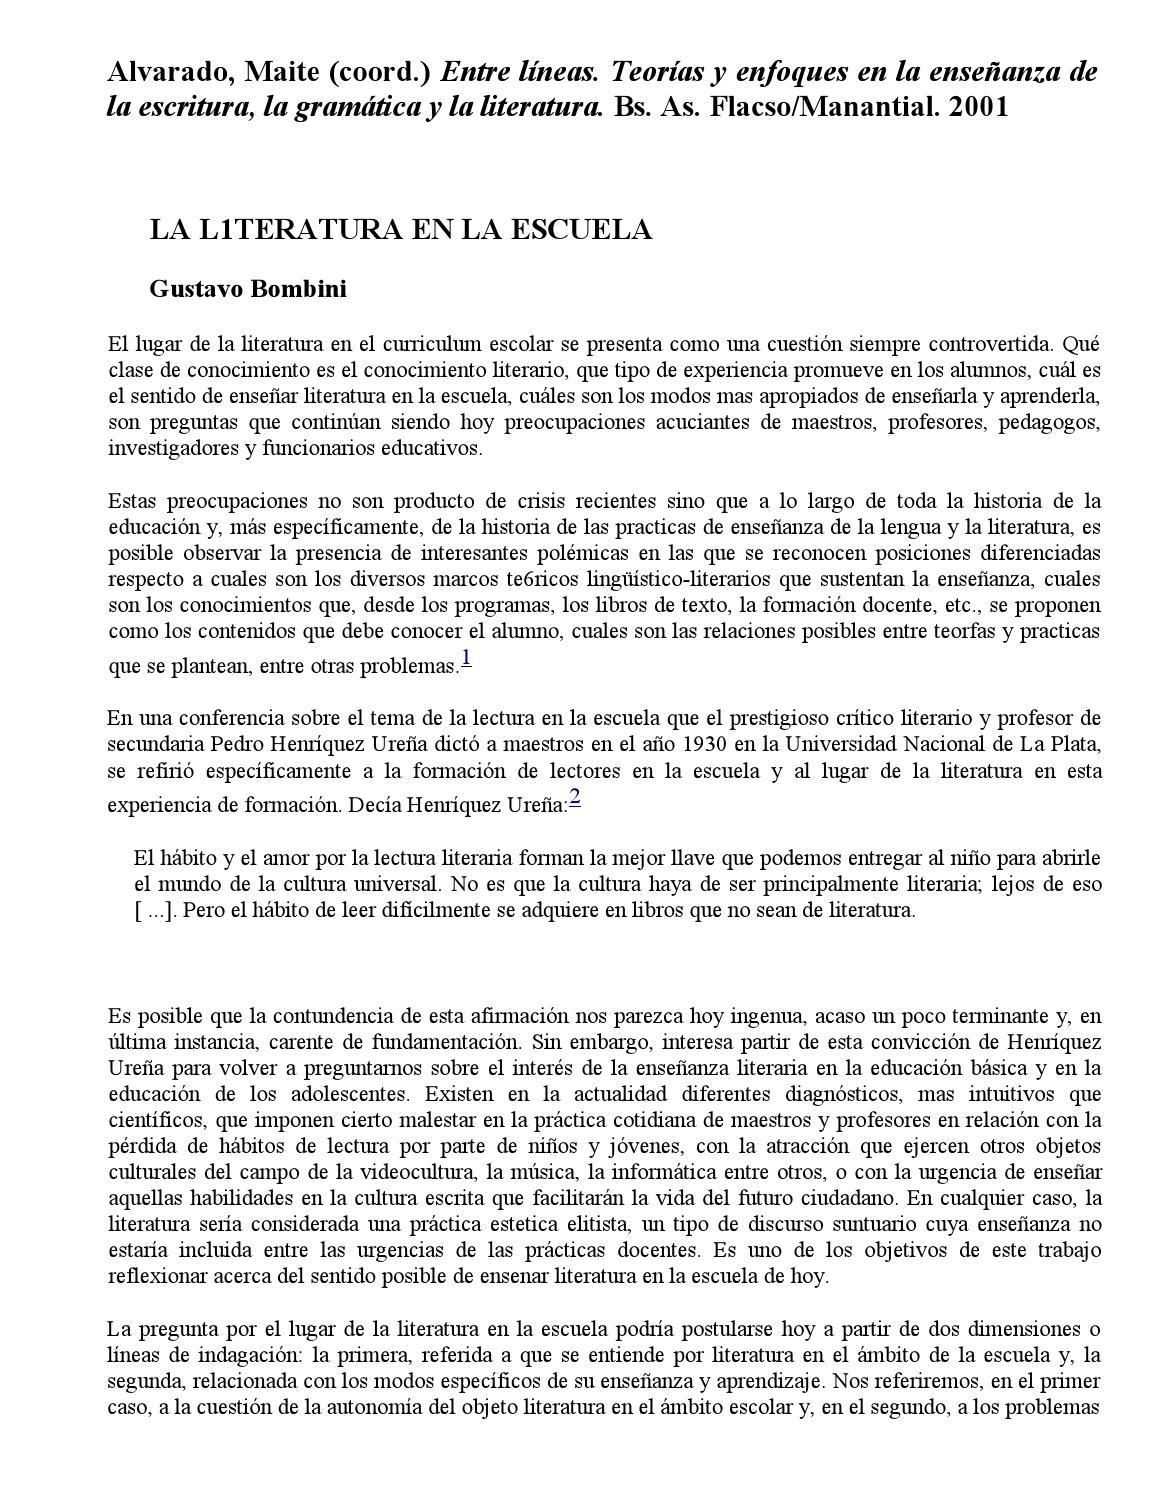 Bombini gustavo la literatura en la escuela (1) by Paula Scars - issuu